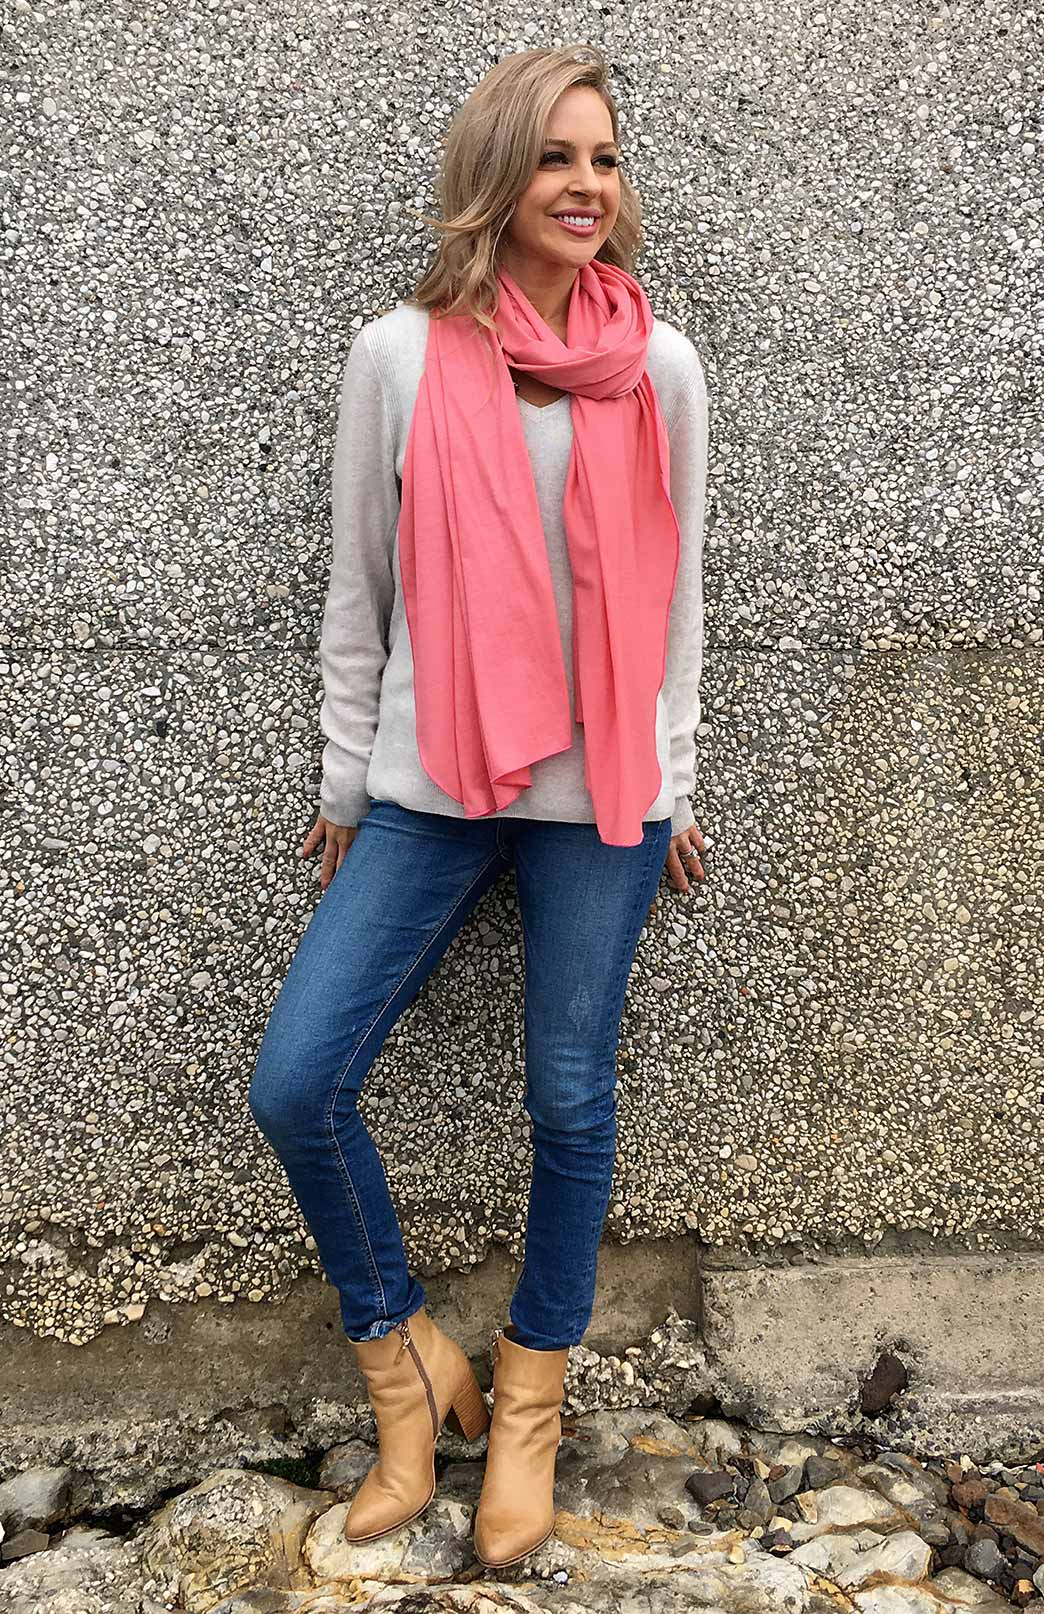 Scarves - Lightweight - Women's Superfine 100% Merino Wool Classic Wide Scarf - Smitten Merino Tasmania Australia